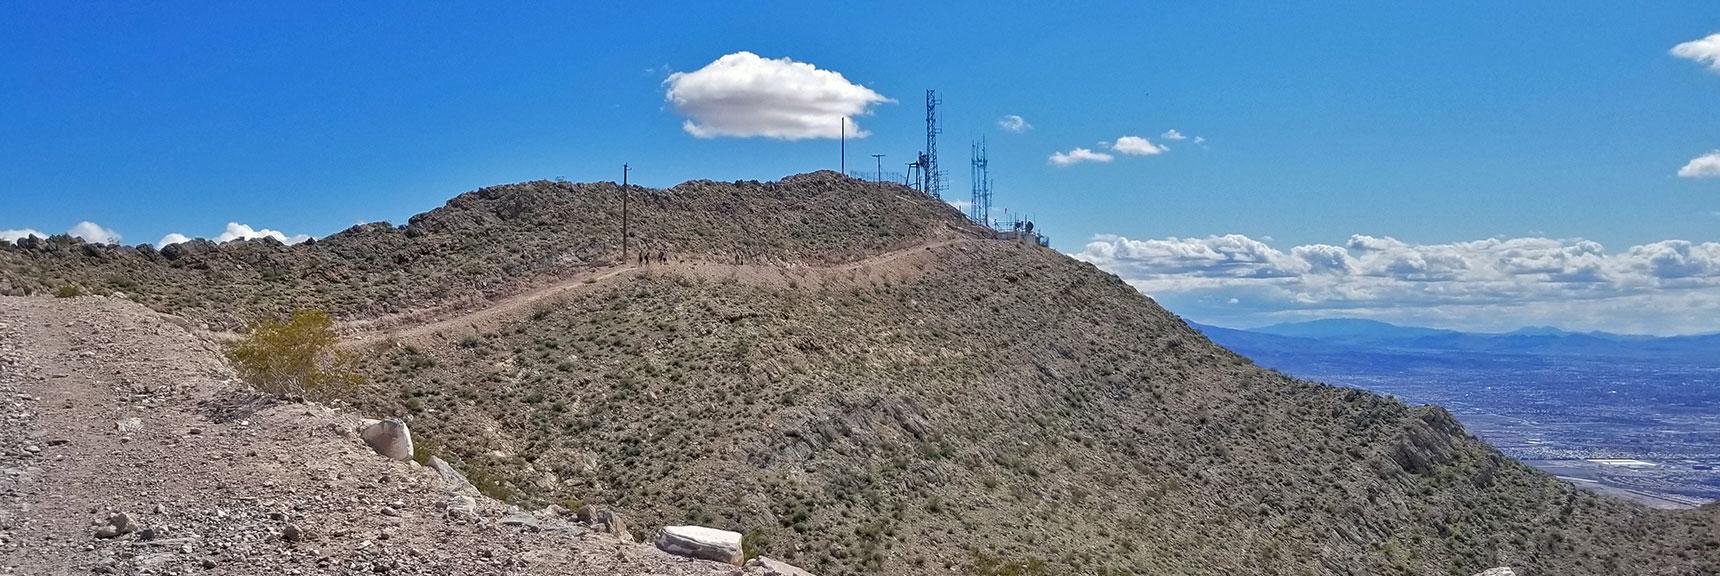 View Toward Second Summit of Frenchman Mountain, Nevada